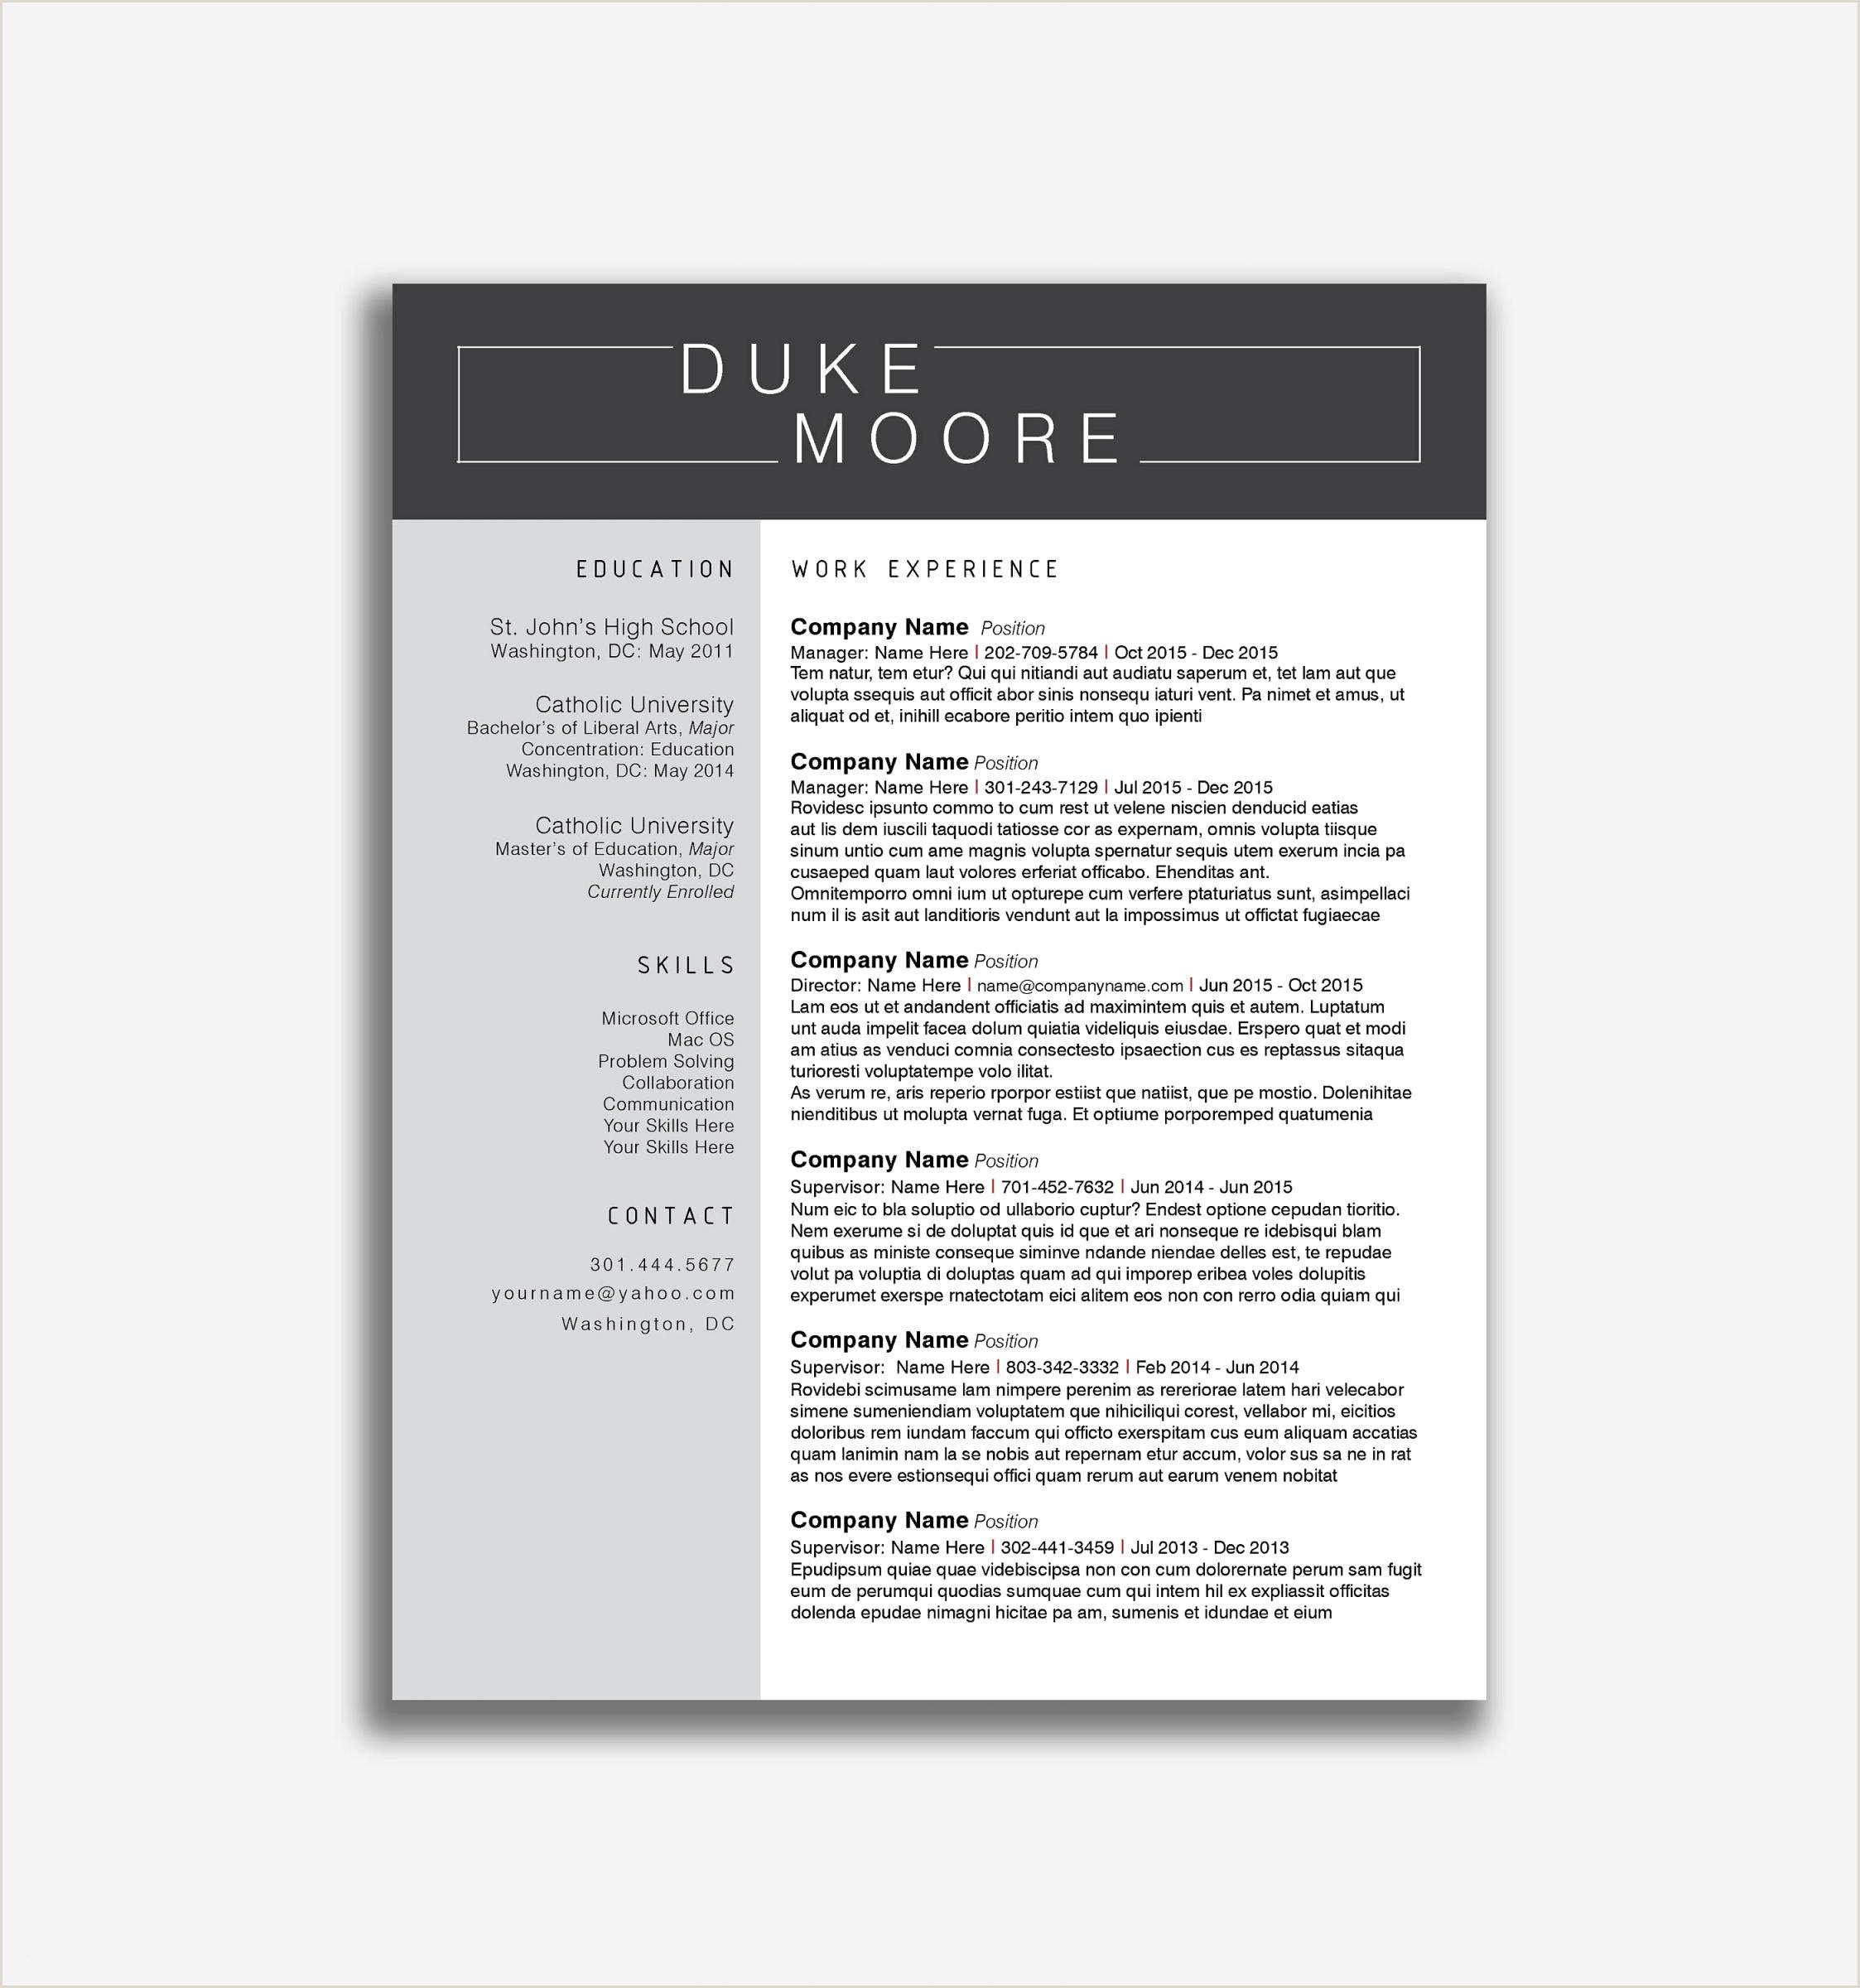 Lebenslauf Muster Word Mit Foto Template Cv Gratuit Exemple Lebenslauf Vorlage Libreoffice